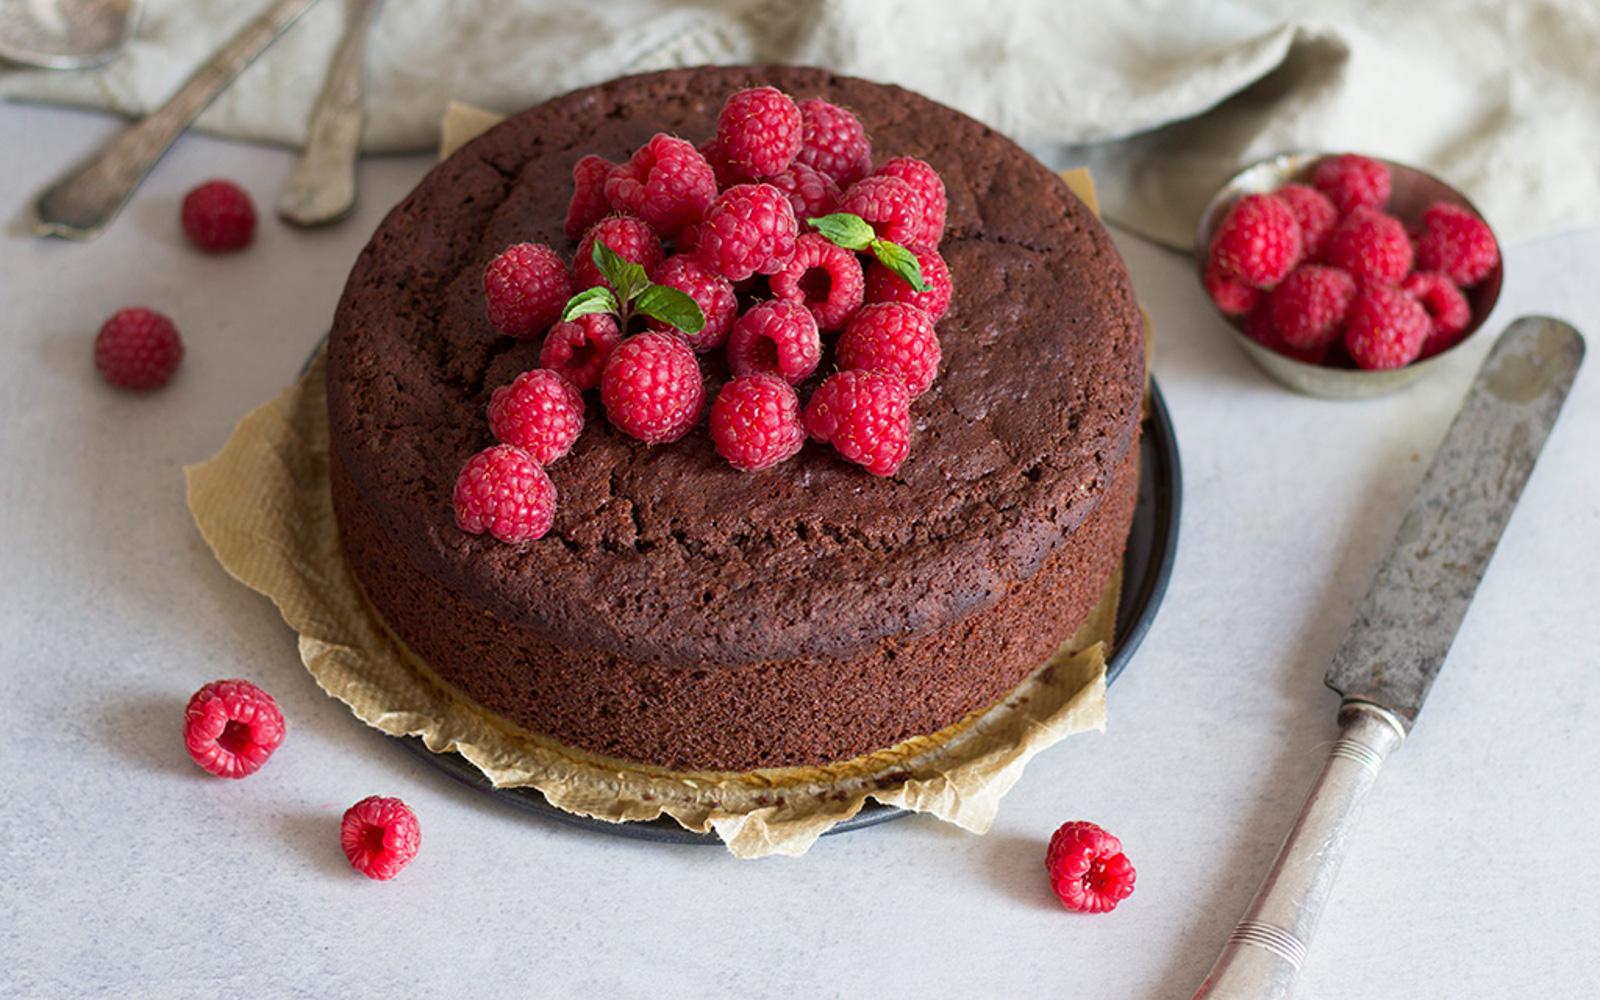 Vegan Gluten-Free Chocolate Sponge Cake Topped with Raspberries